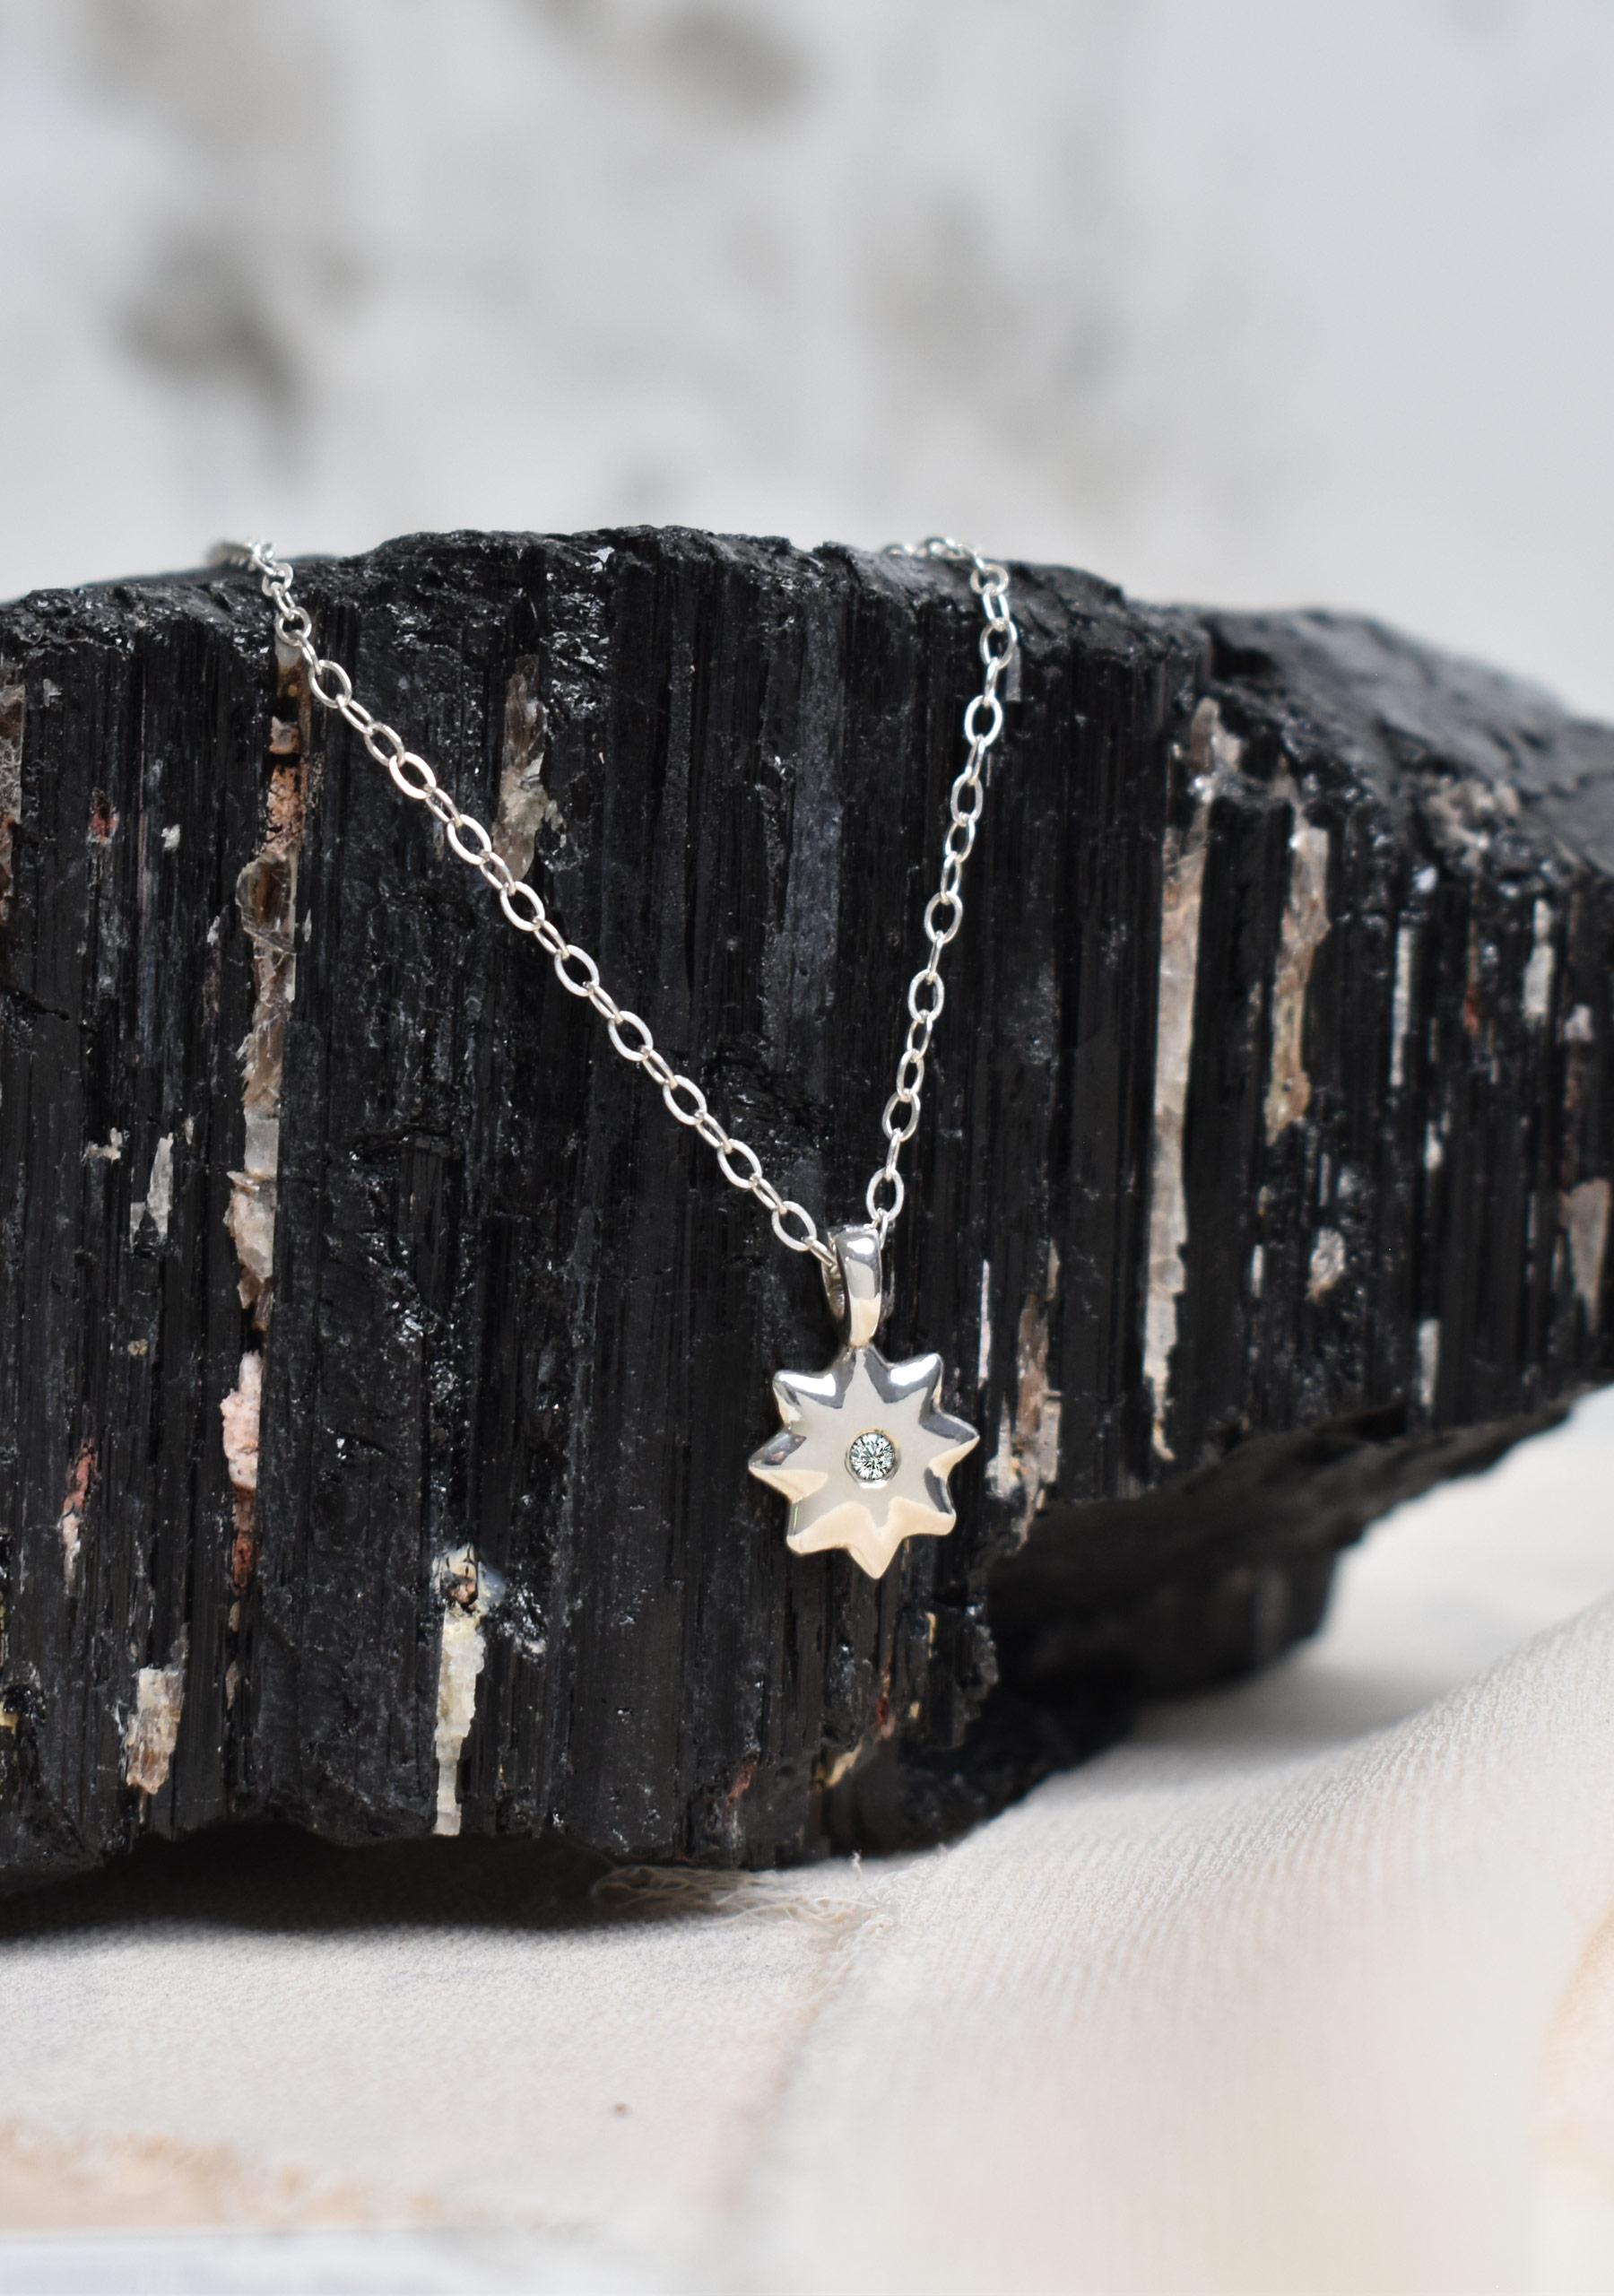 Sterling Silver Diamond Star Pendant Necklace